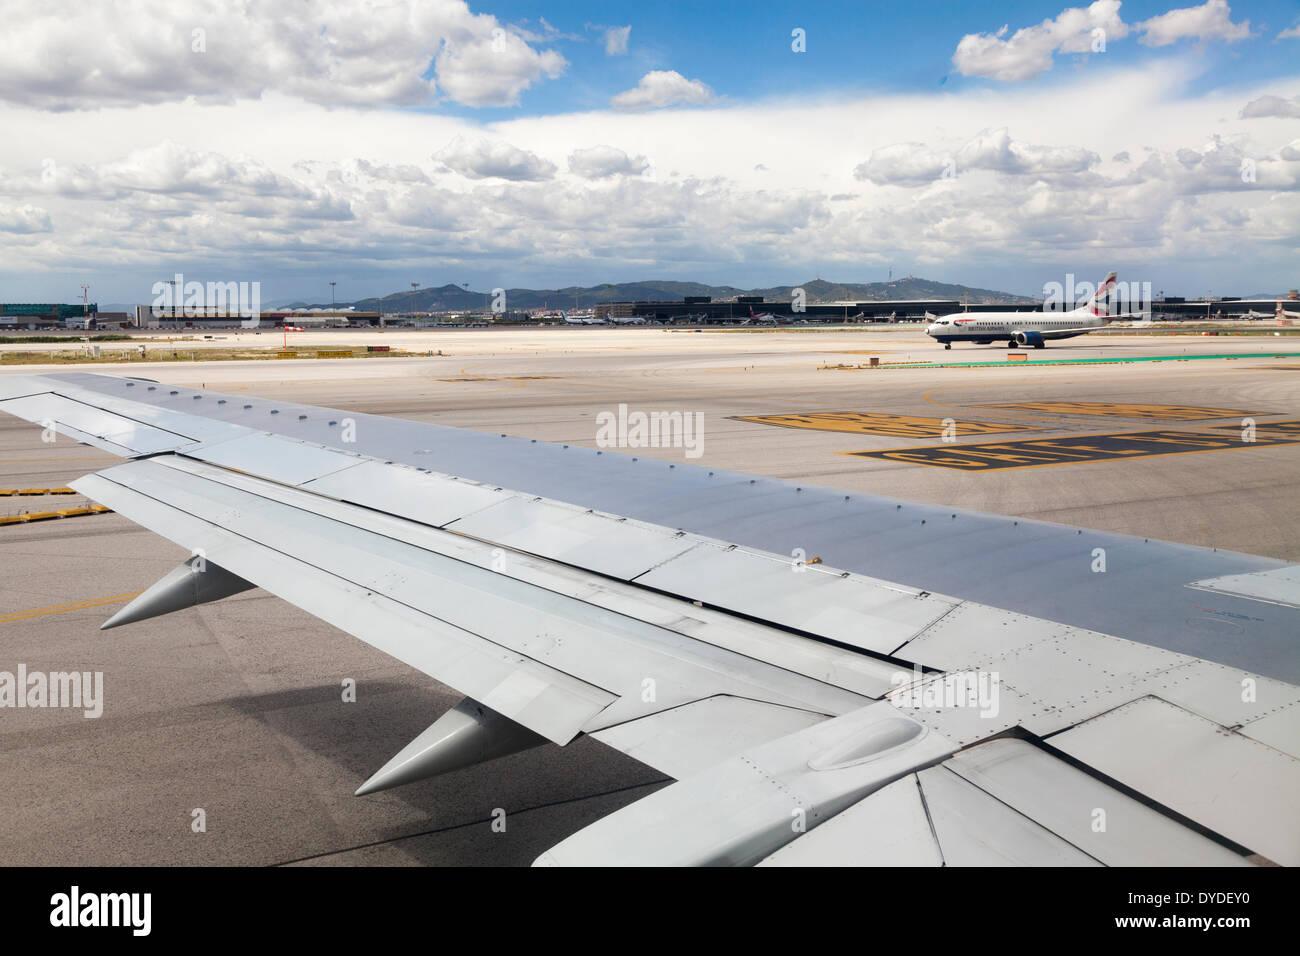 British Airways jet and wing on Barcelona El Prat runway. - Stock Image